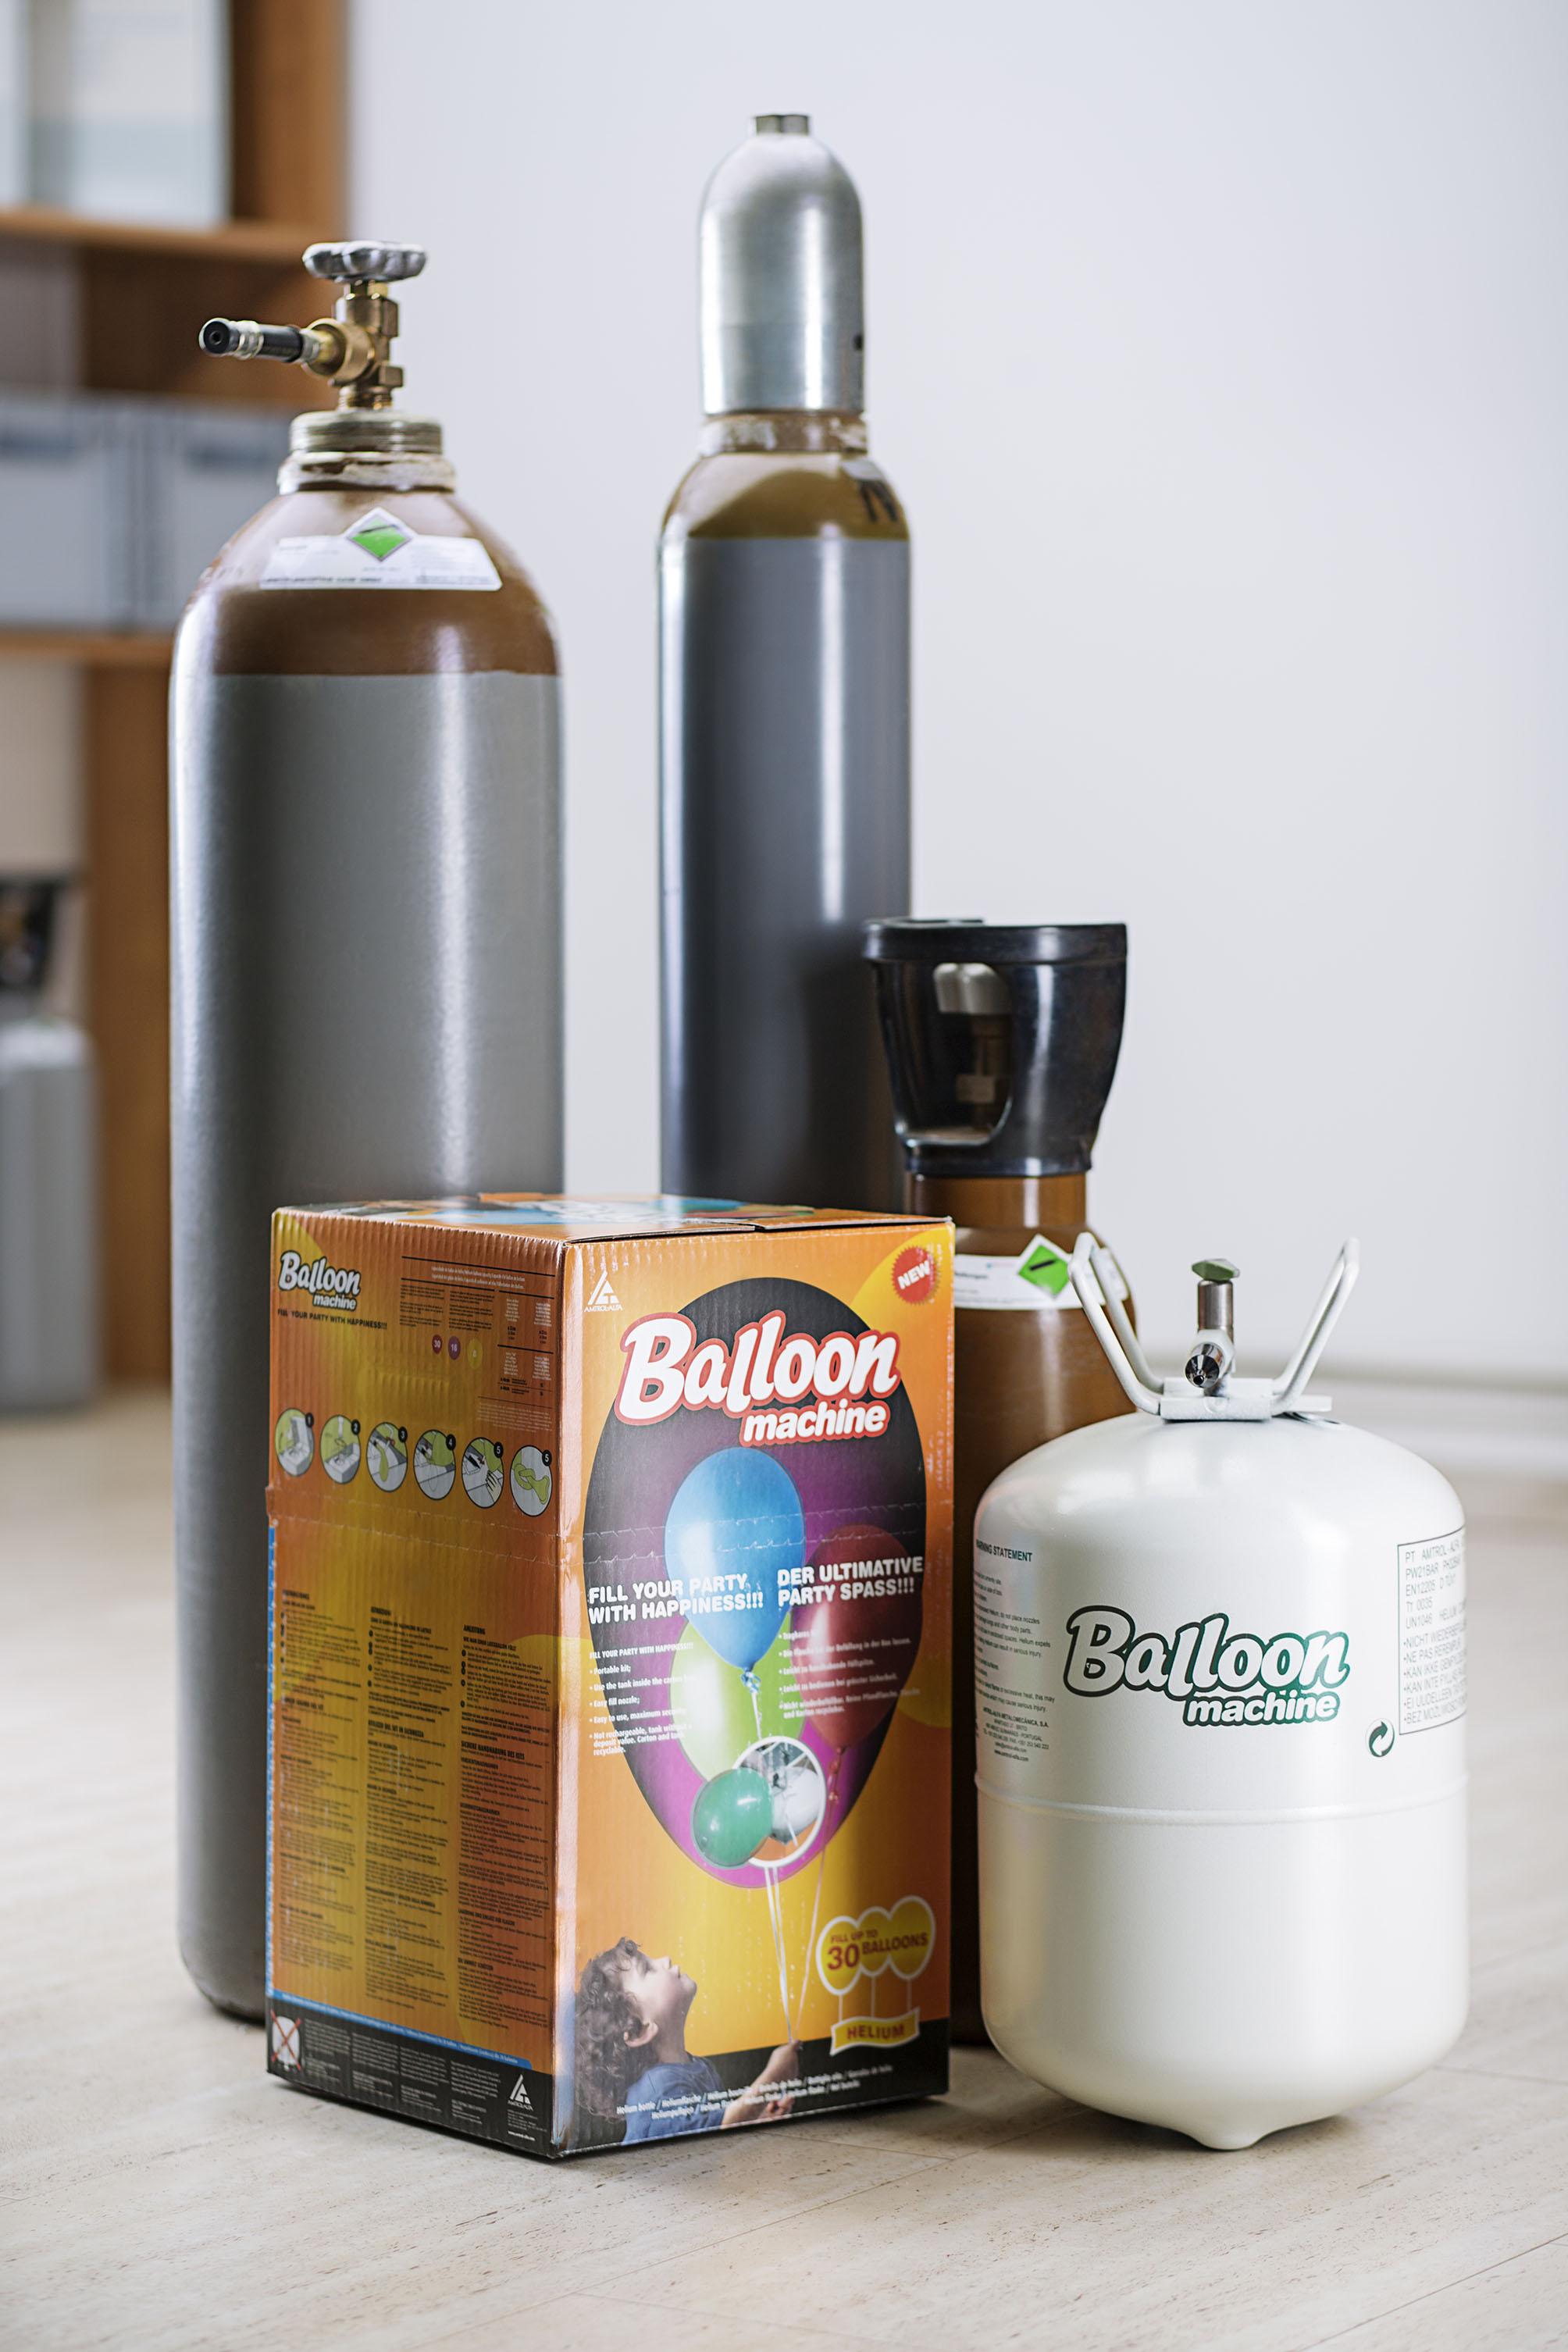 Schulz Gase_Produkt_Ballon_0209 VB